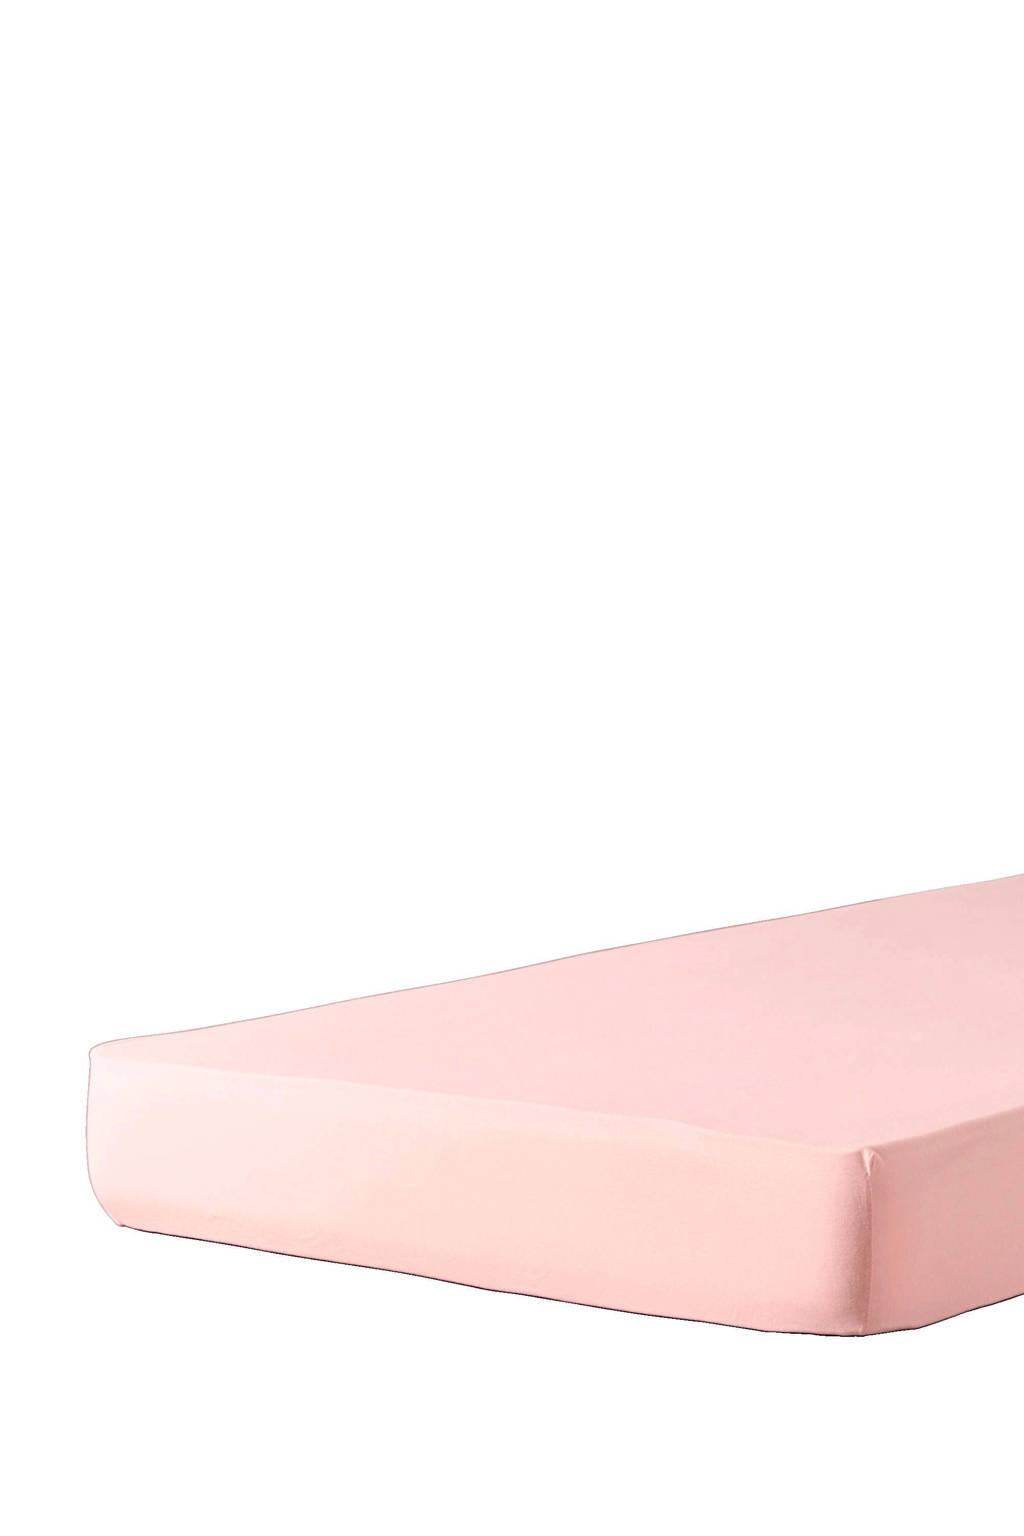 whkmp's own jersey ledikanthoeslaken (60x120 cm) Roze